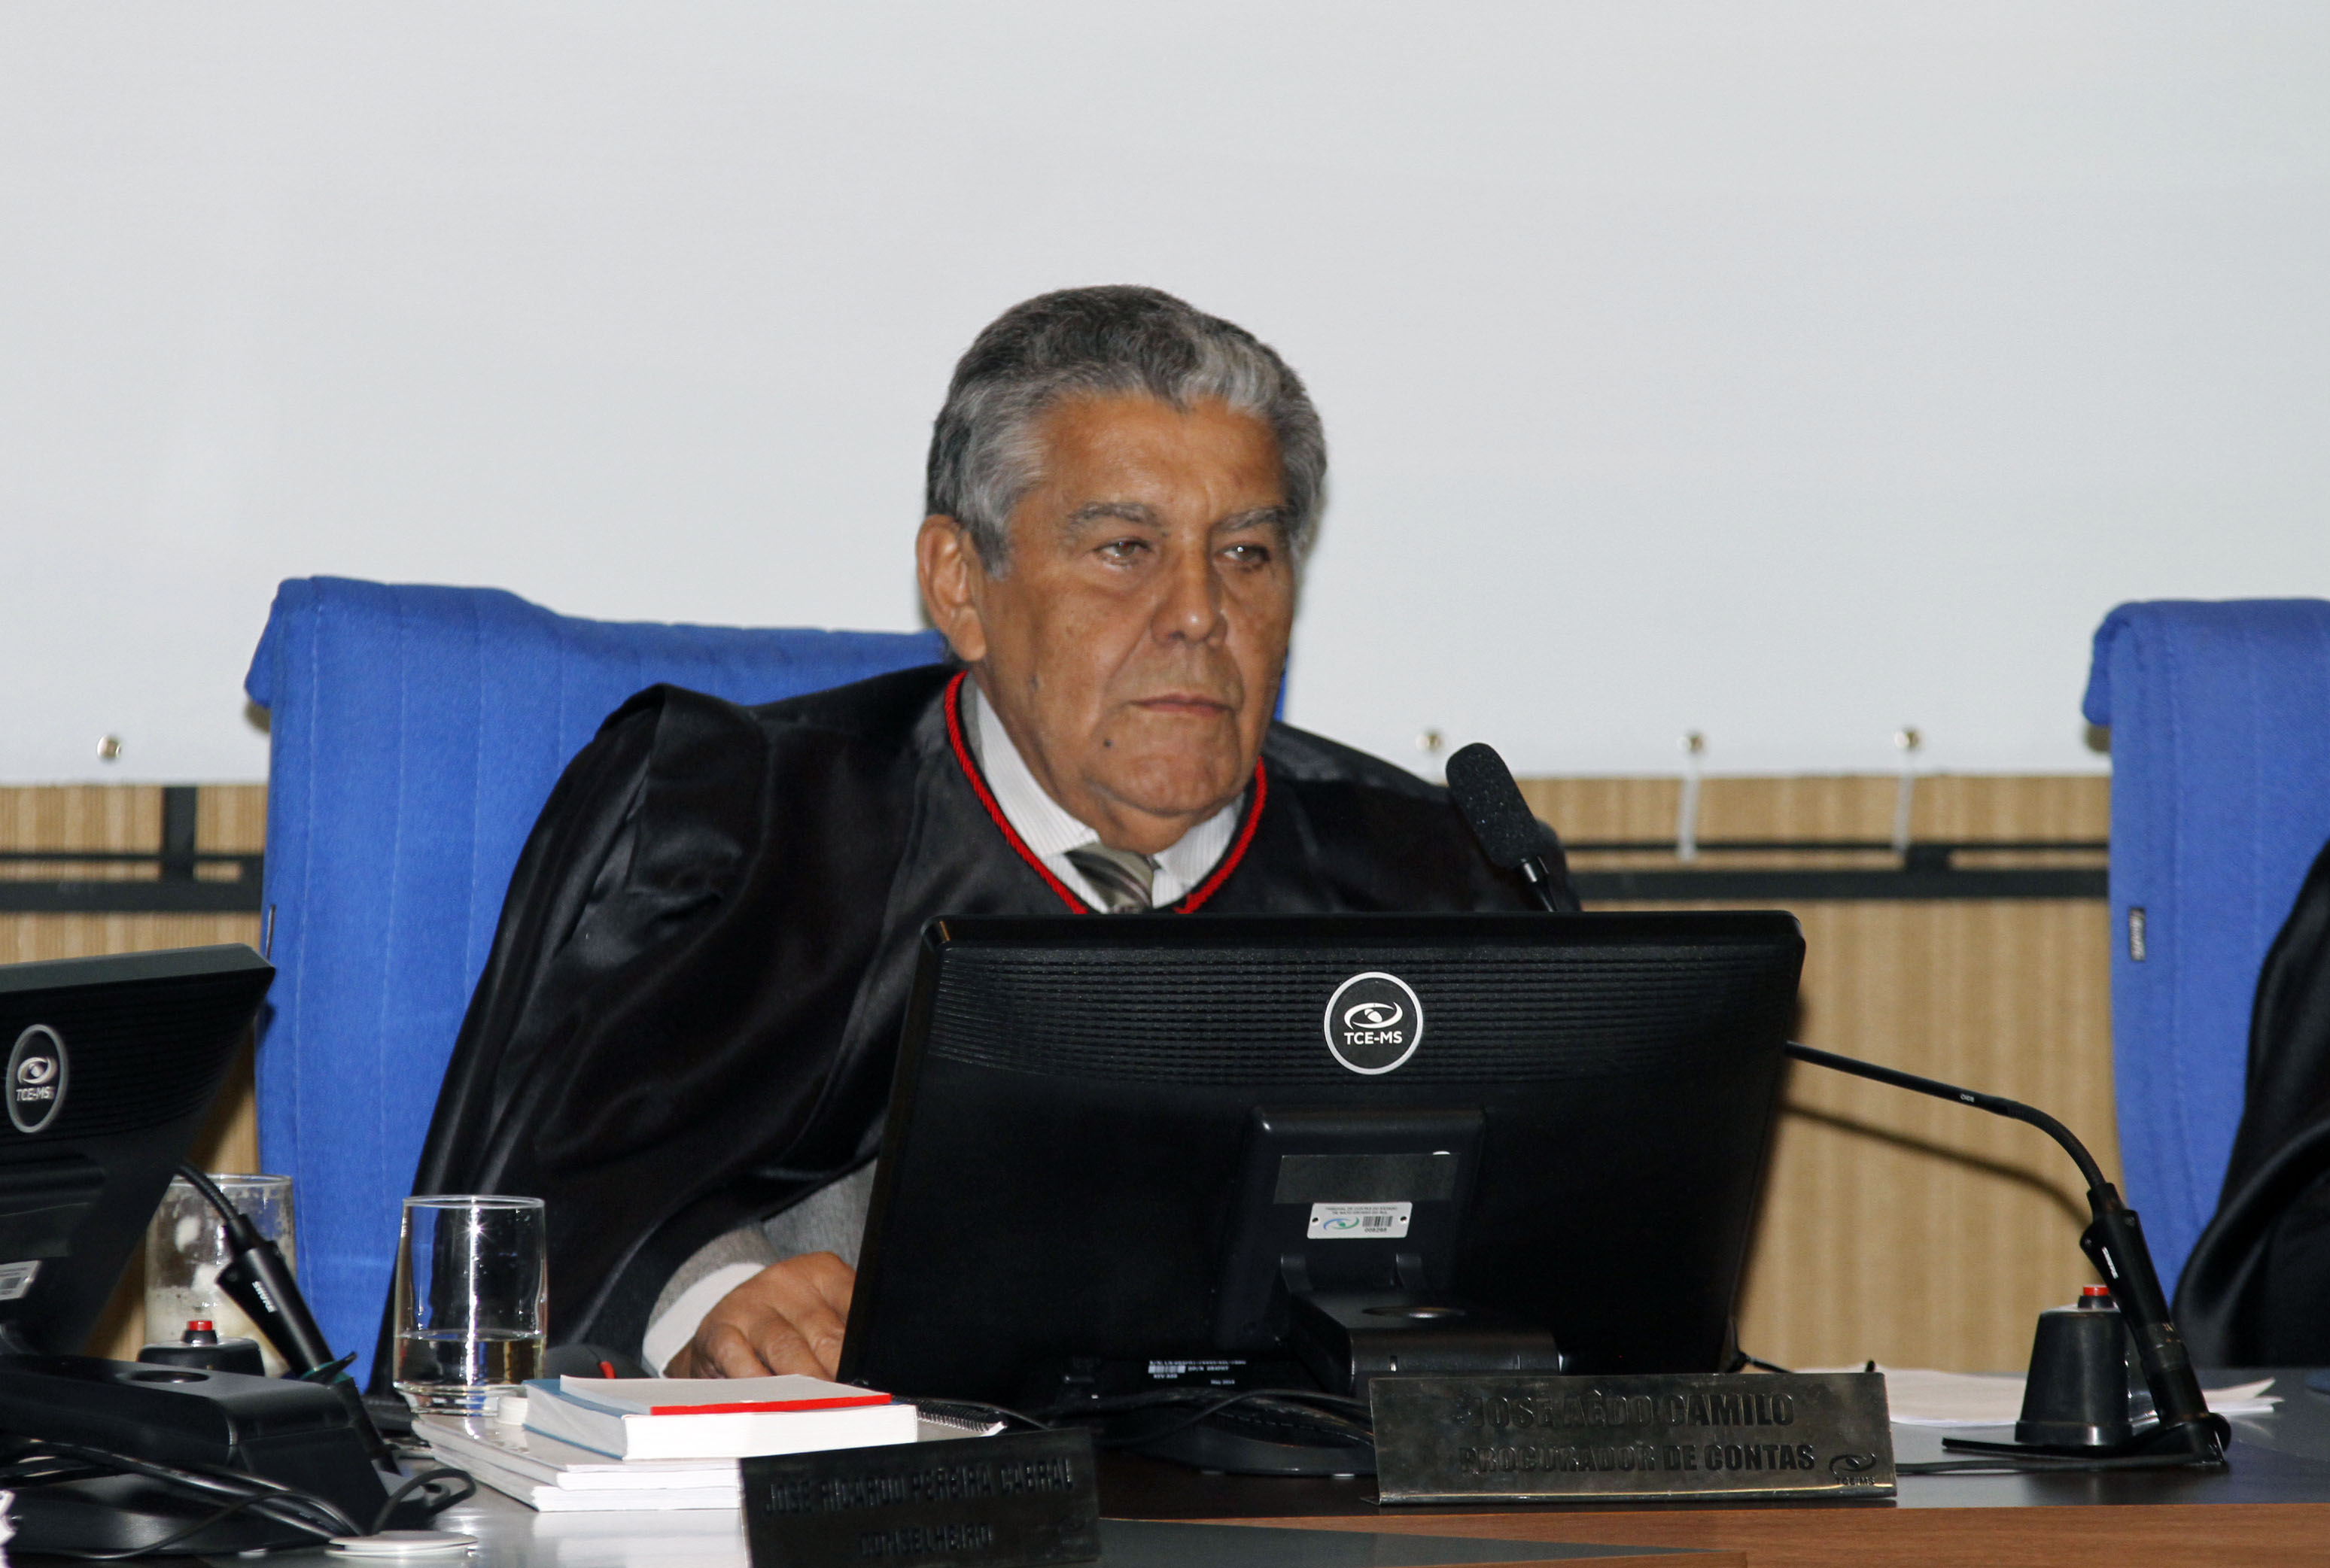 Ex-prefeito de Anastácio terá que devolver R$ 120 mil aos cofres públicos